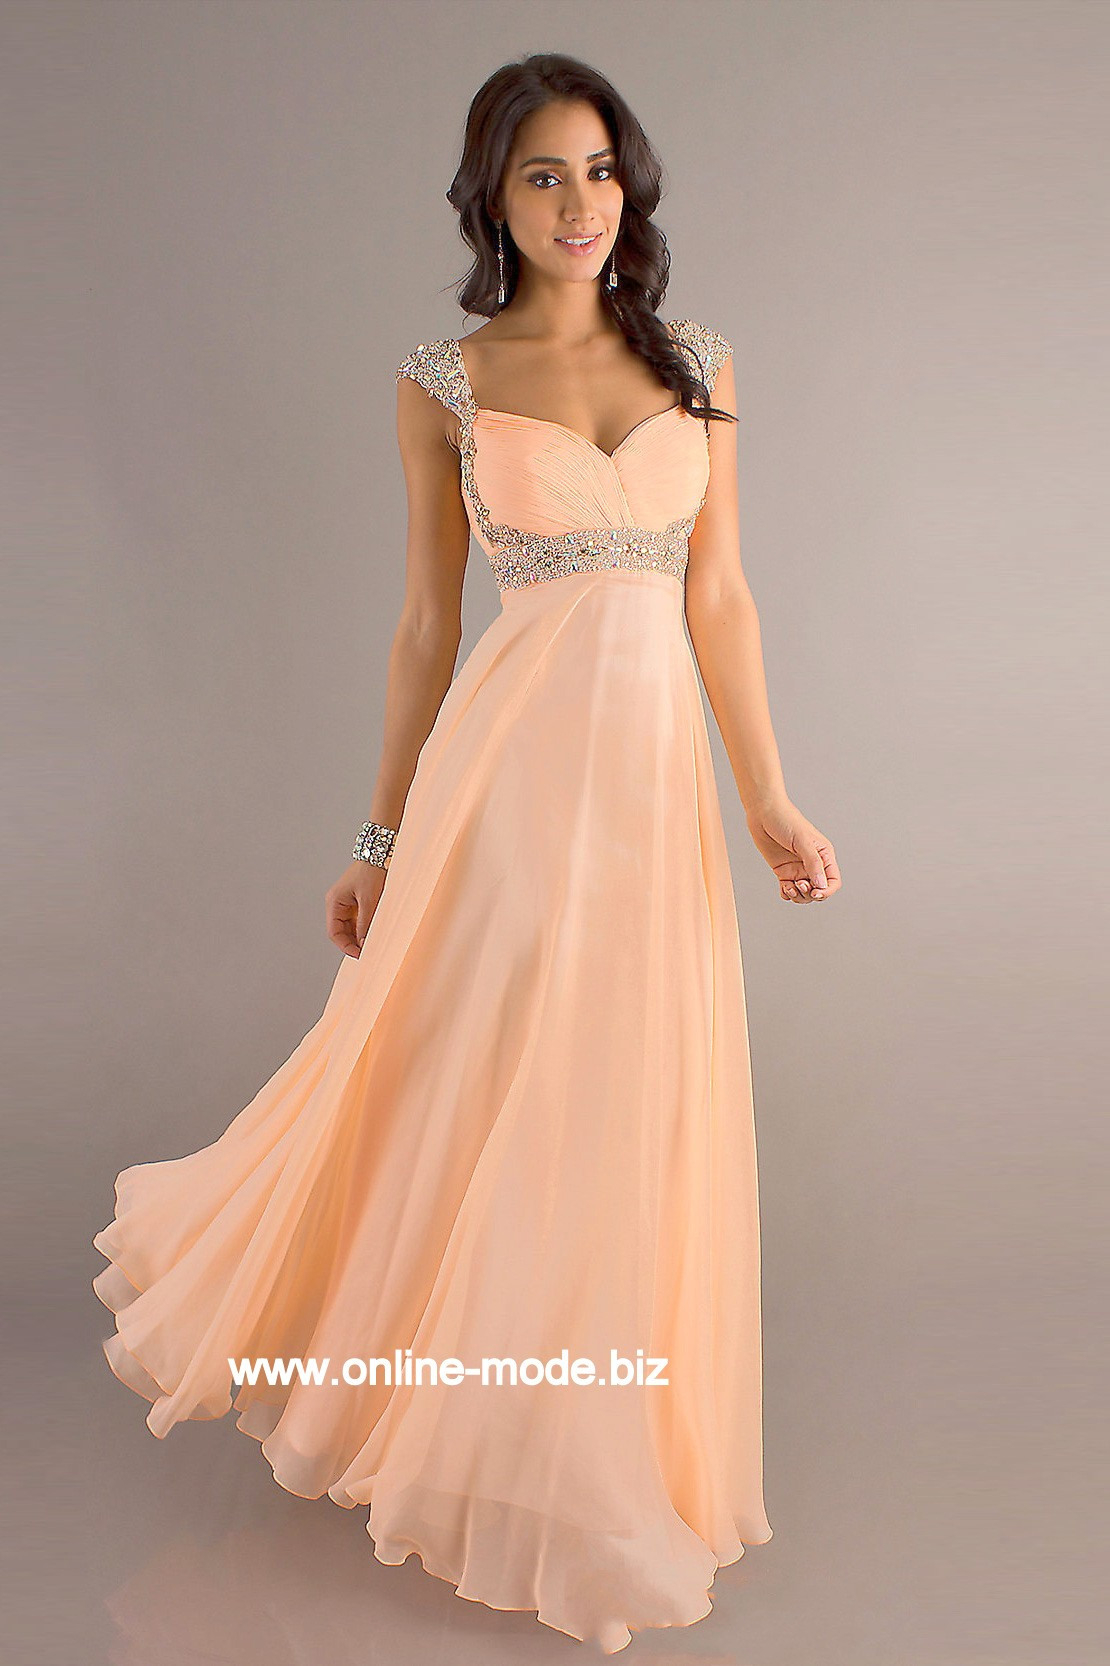 13 Perfekt Abendkleid Damen Stylish20 Genial Abendkleid Damen Vertrieb